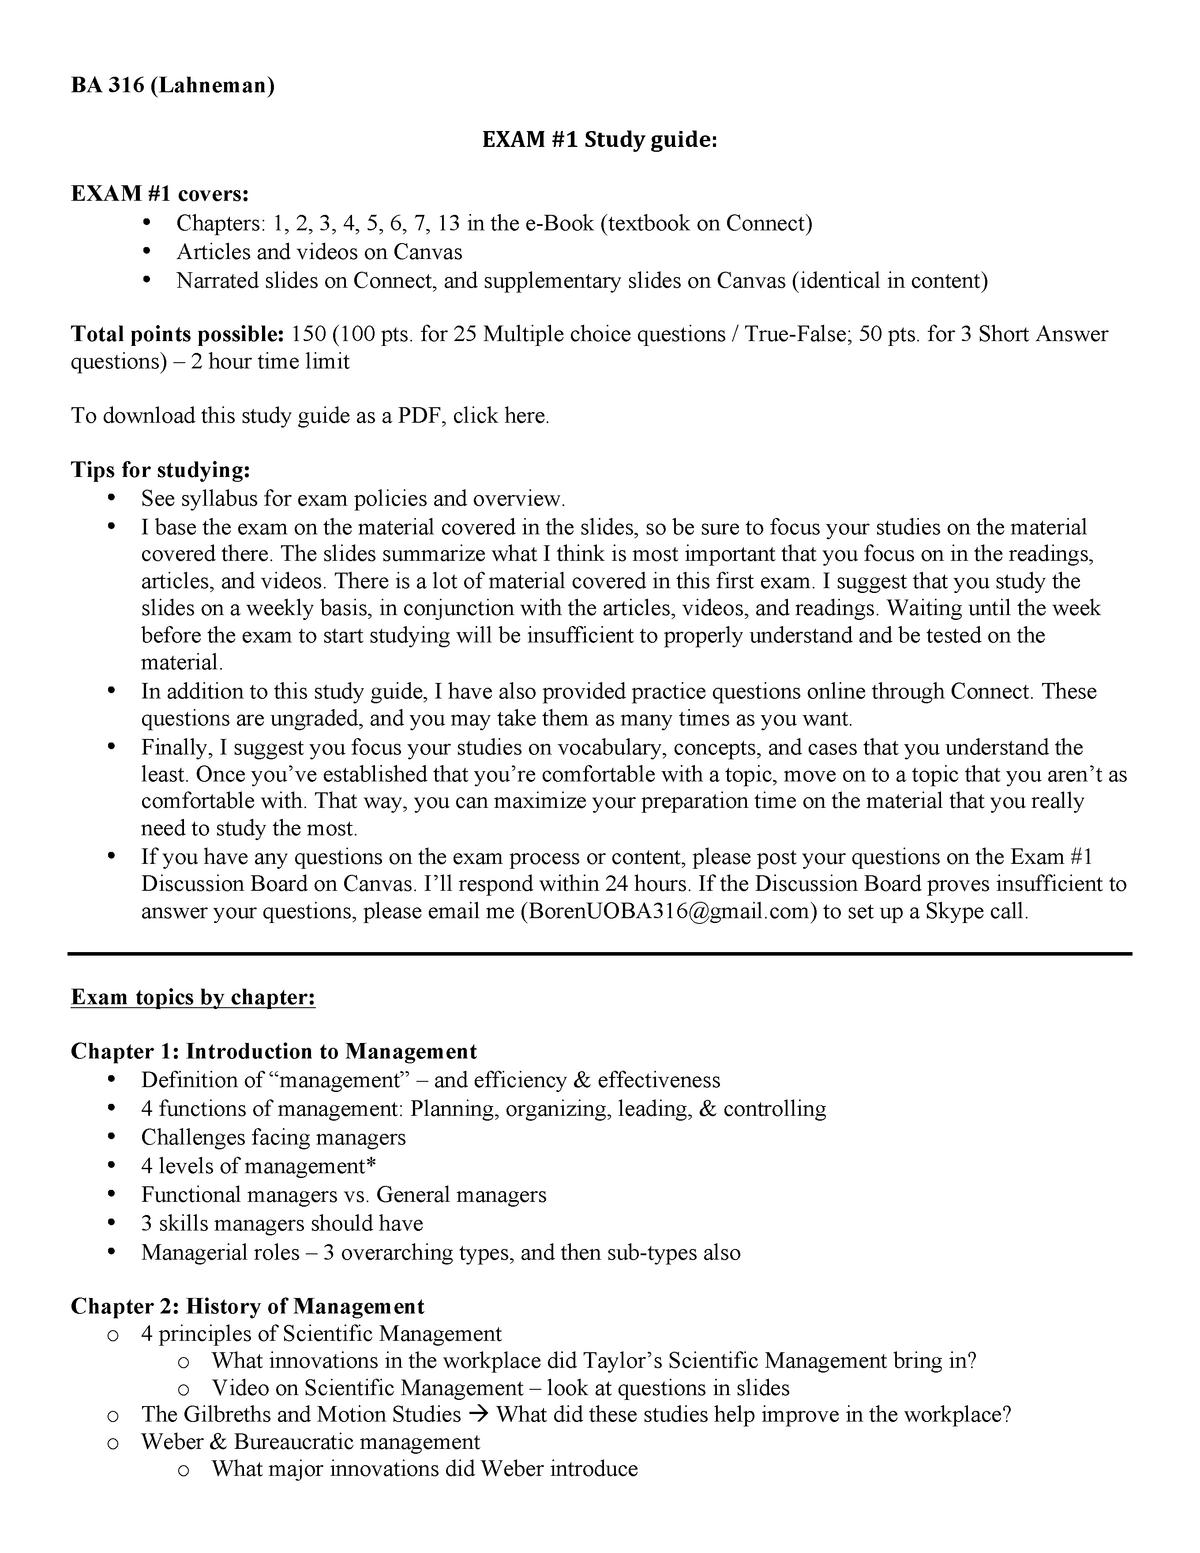 BA 316 Online - Exam #1 Study Guide - Management BA 316